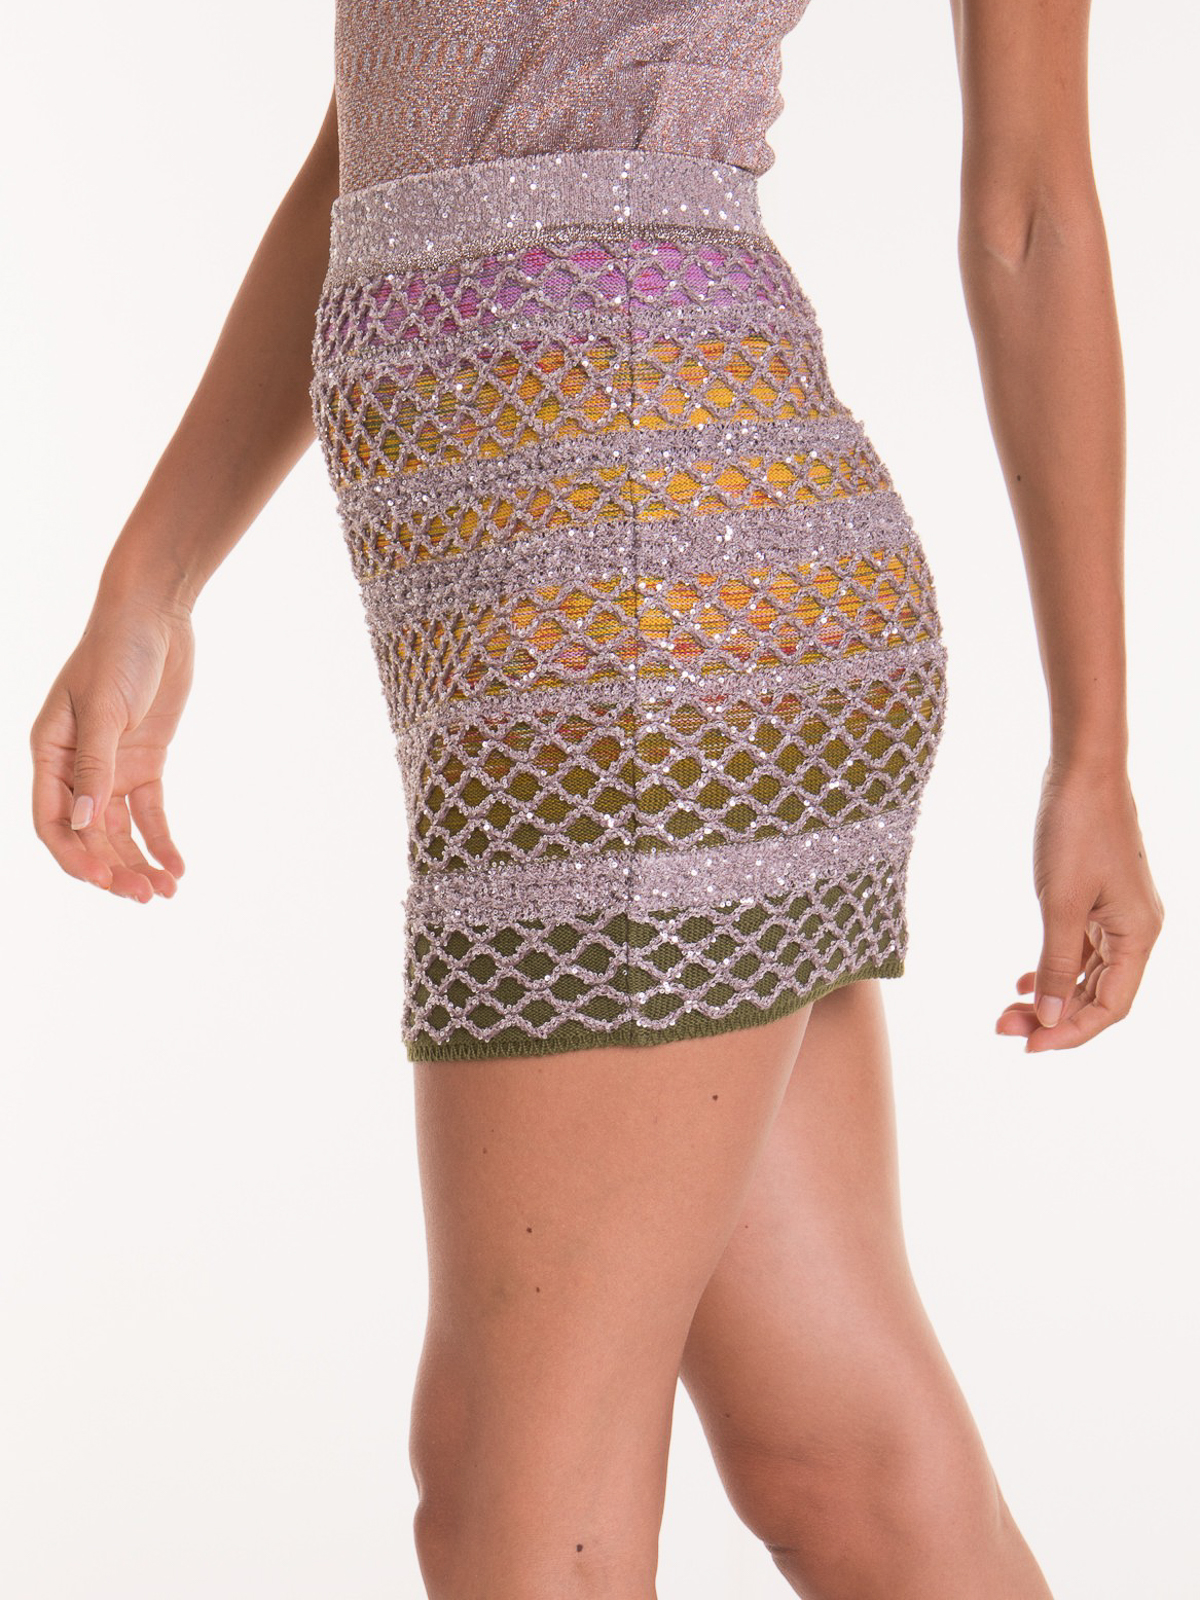 Mesh mini skirts online Mini Skirts Missoni Sequin Embellished Open Knit Mesh Mini Skirt Mdh00209bk00mhsm31r